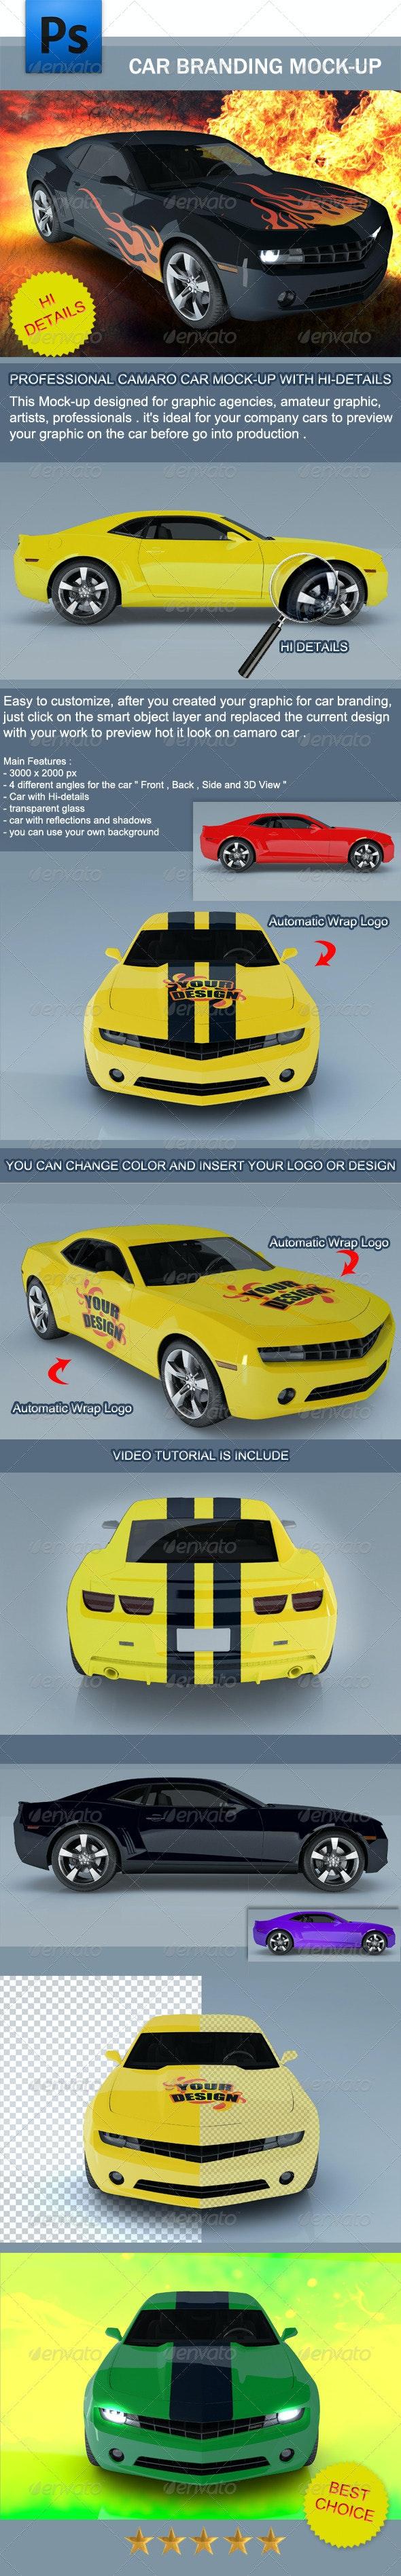 Camaro Car Branding Mock-up - Product Mock-Ups Graphics